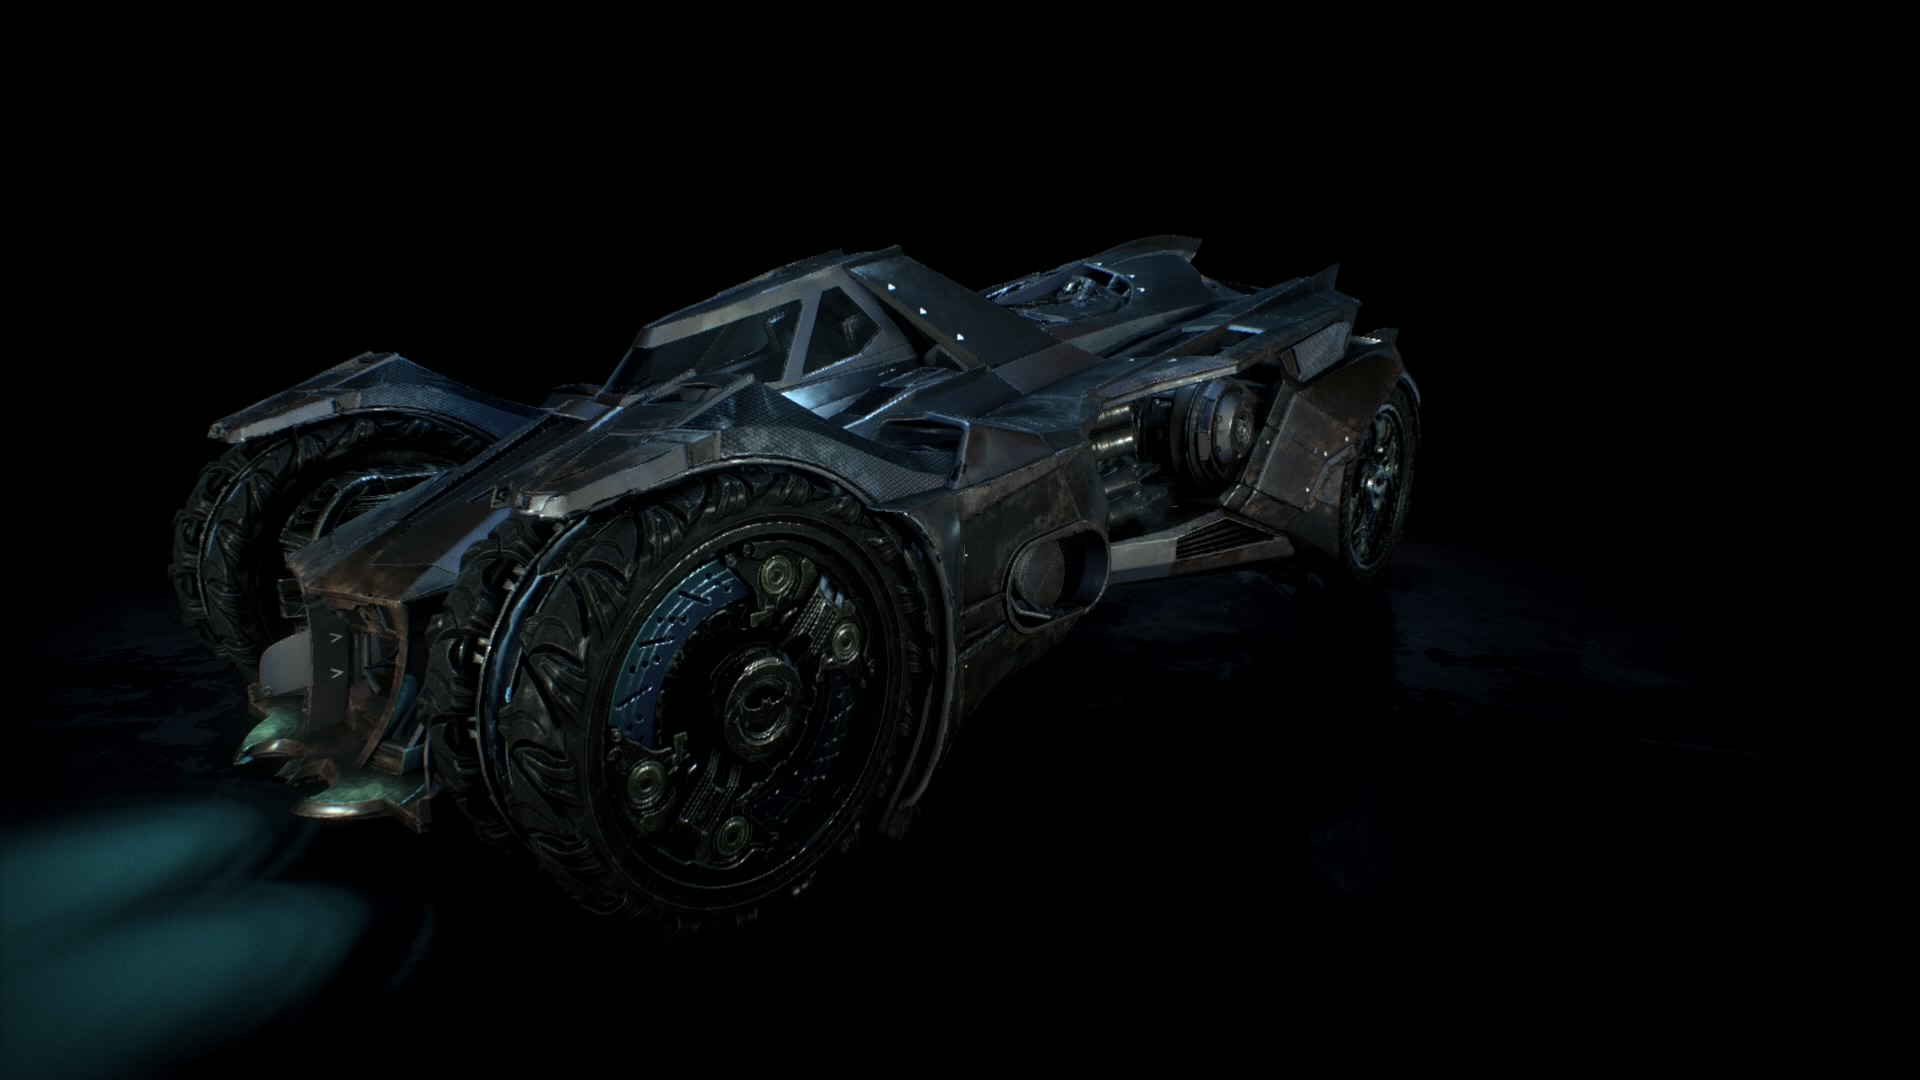 Recenze: Batman Arkham Knight – Strach nad Gothamem 10718